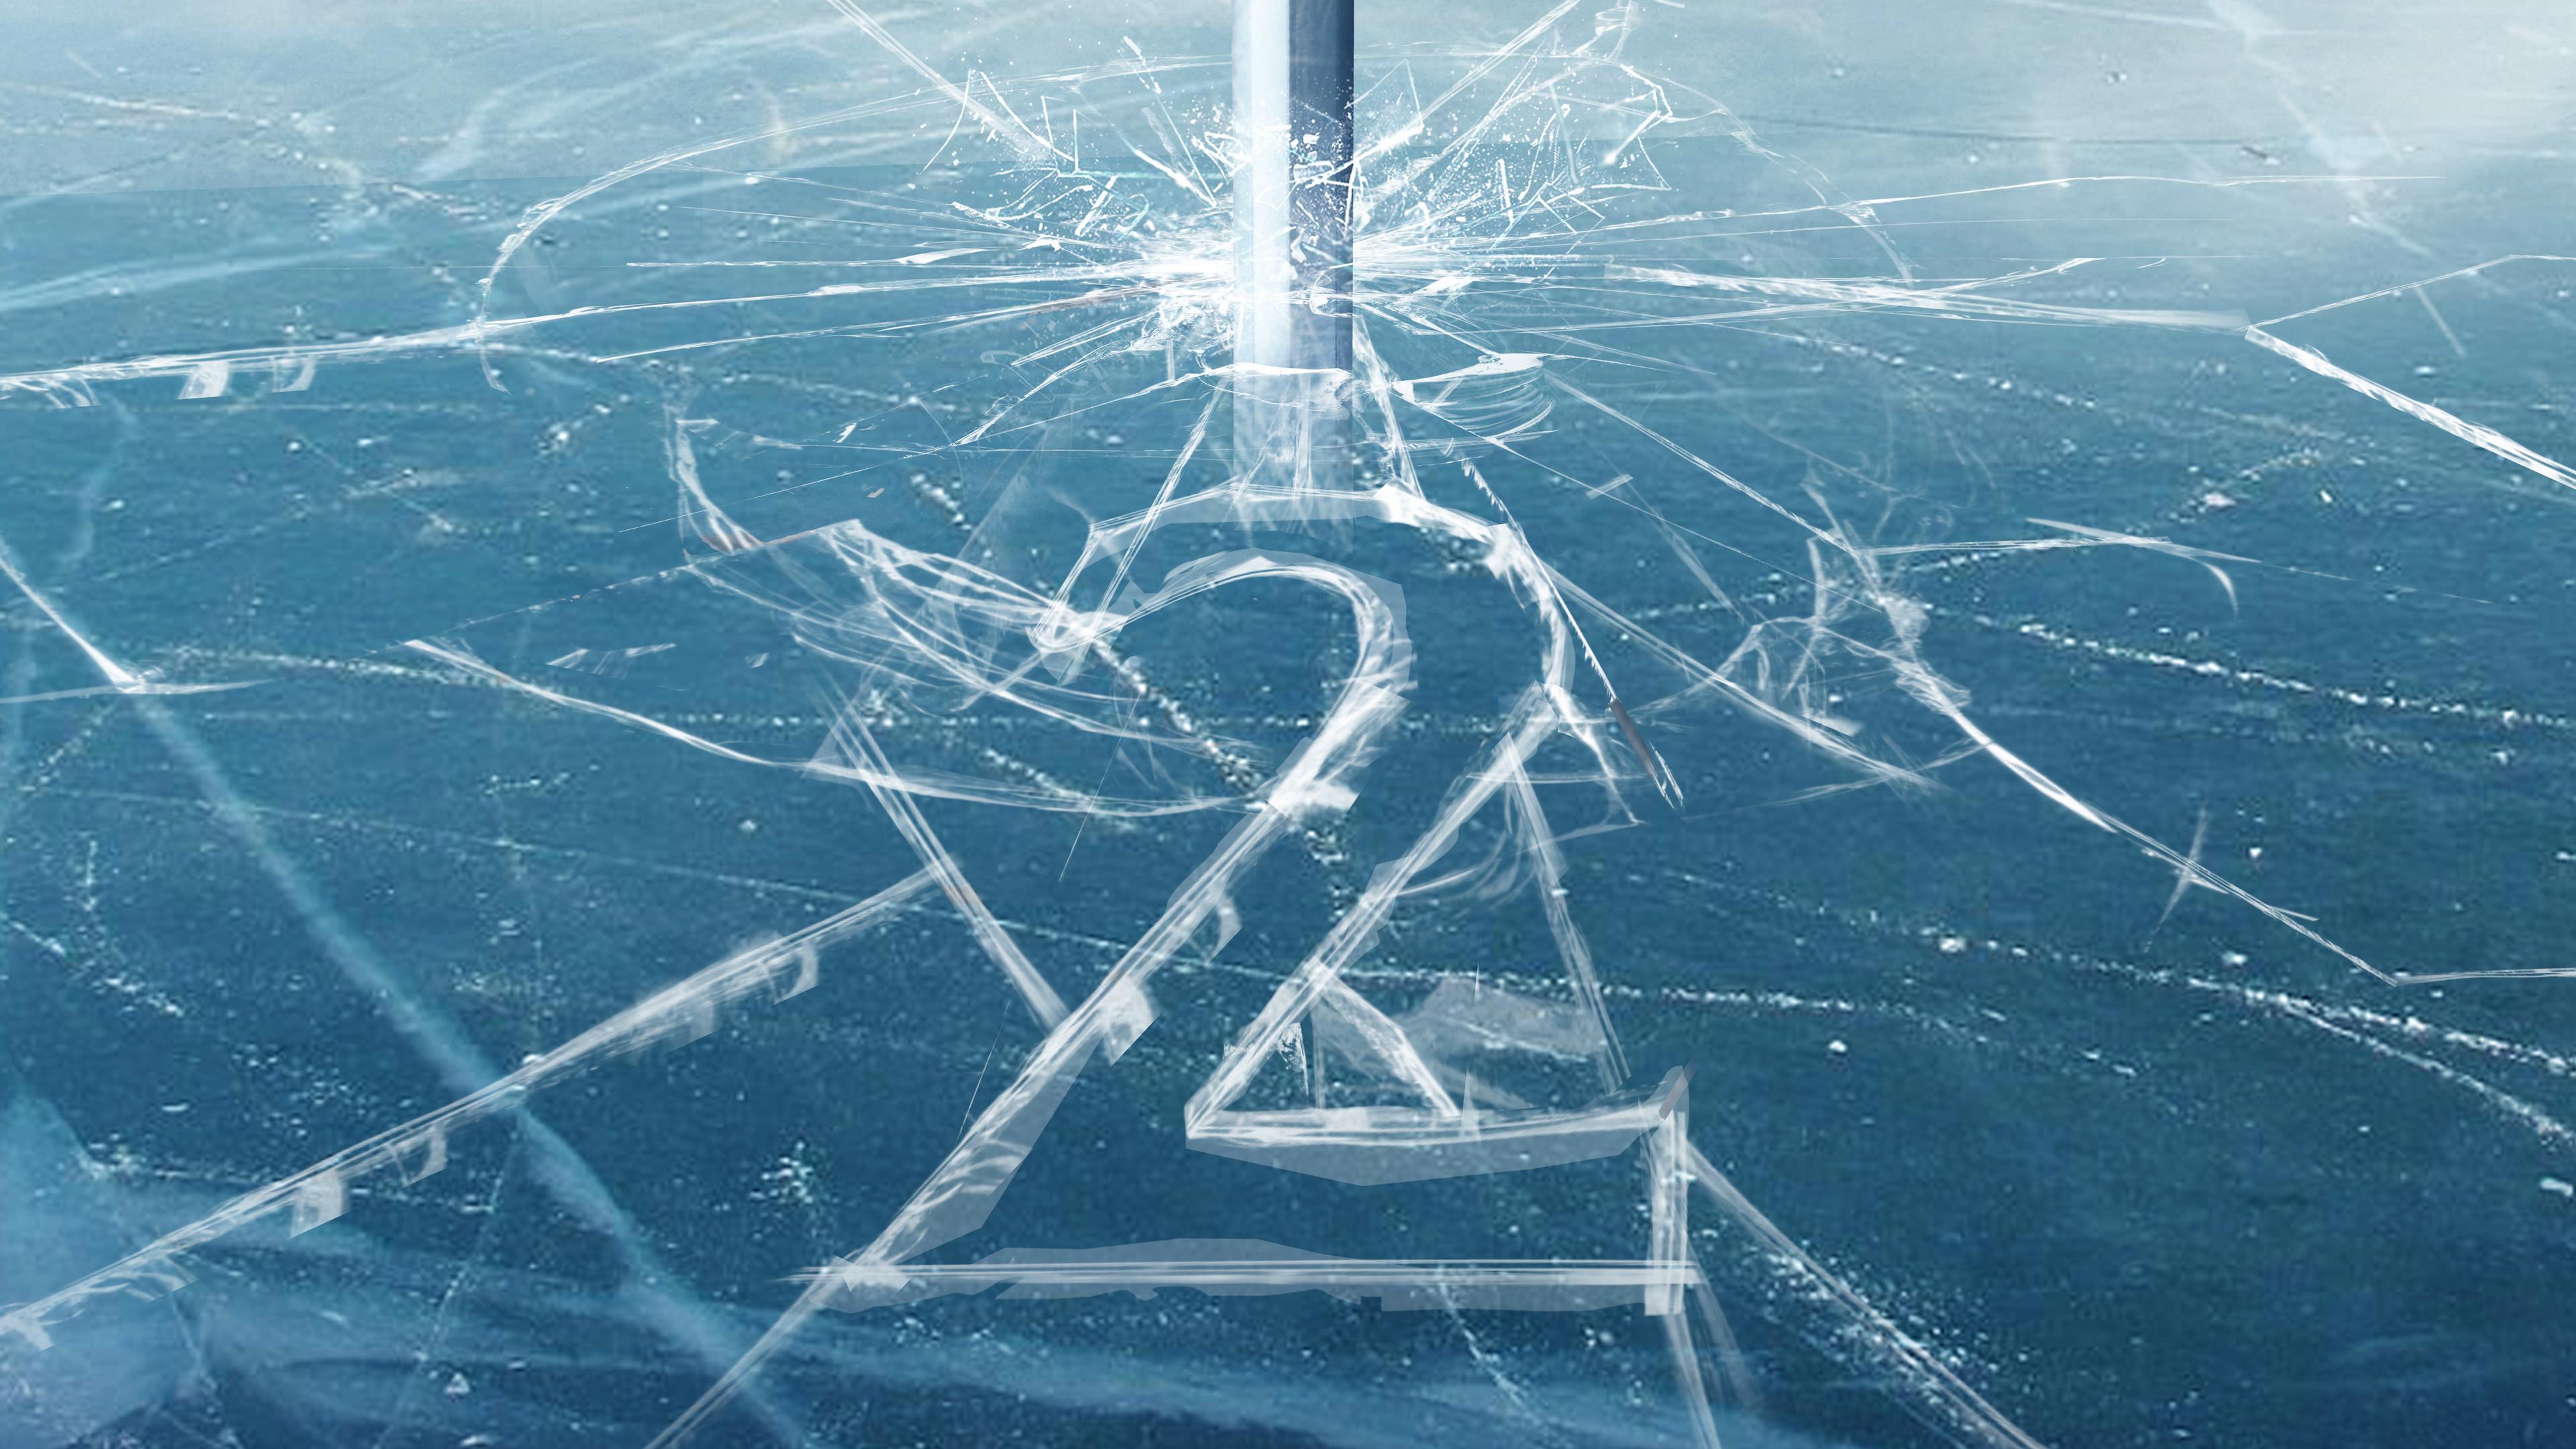 frozen 2 movie poster 4k 1553074286 - Frozen 2 Movie Poster 4k - movies wallpapers, hd-wallpapers, frozen 2 wallpapers, disney wallpapers, 5k wallpapers, 4k-wallpapers, 2019 movies wallpapers